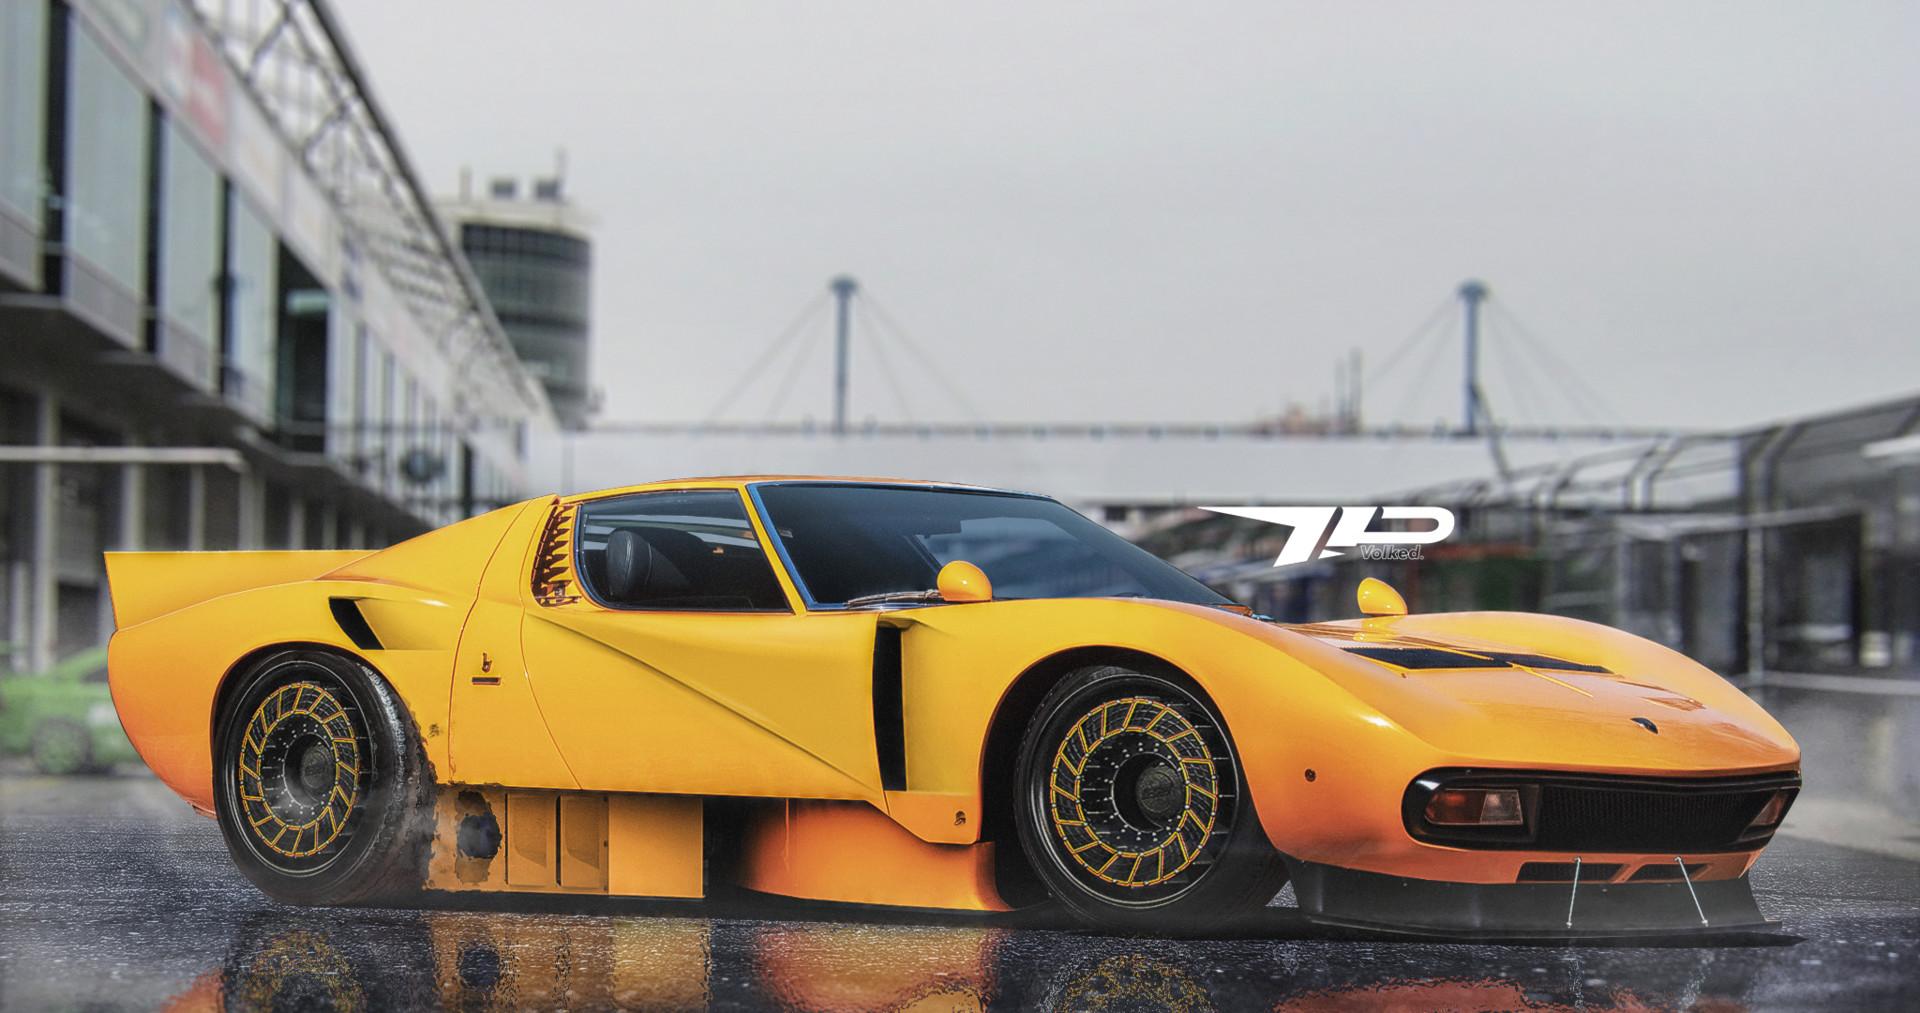 Artstation Lamborghini Miura Le Man S Racer Sergey Volkov